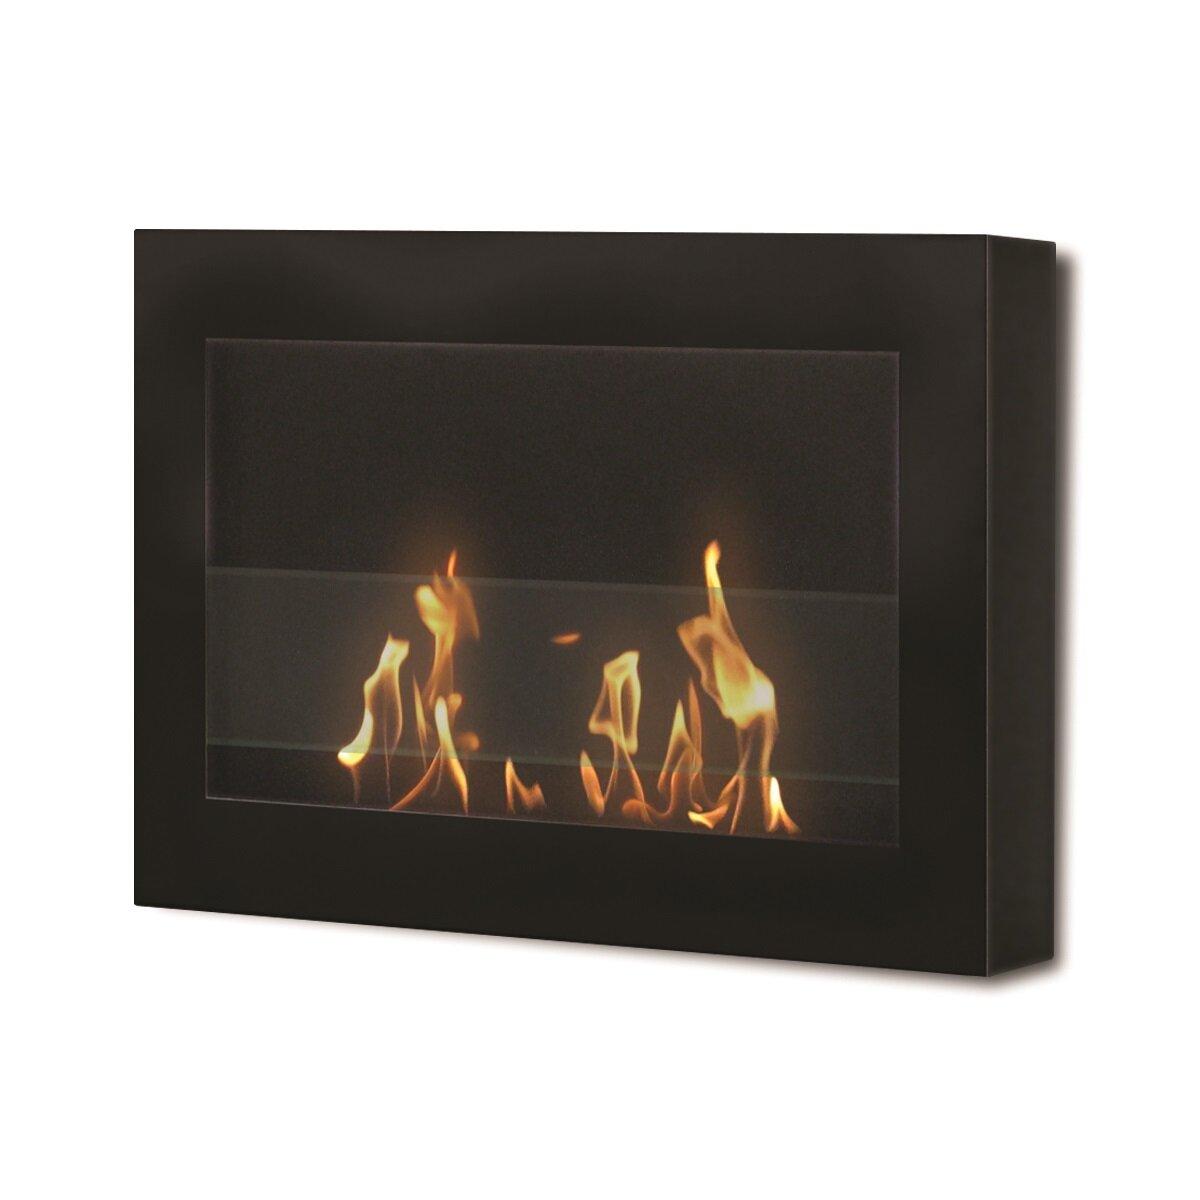 Anywhere Fireplace Soho Wall Mounted Bio Ethanol Fireplace